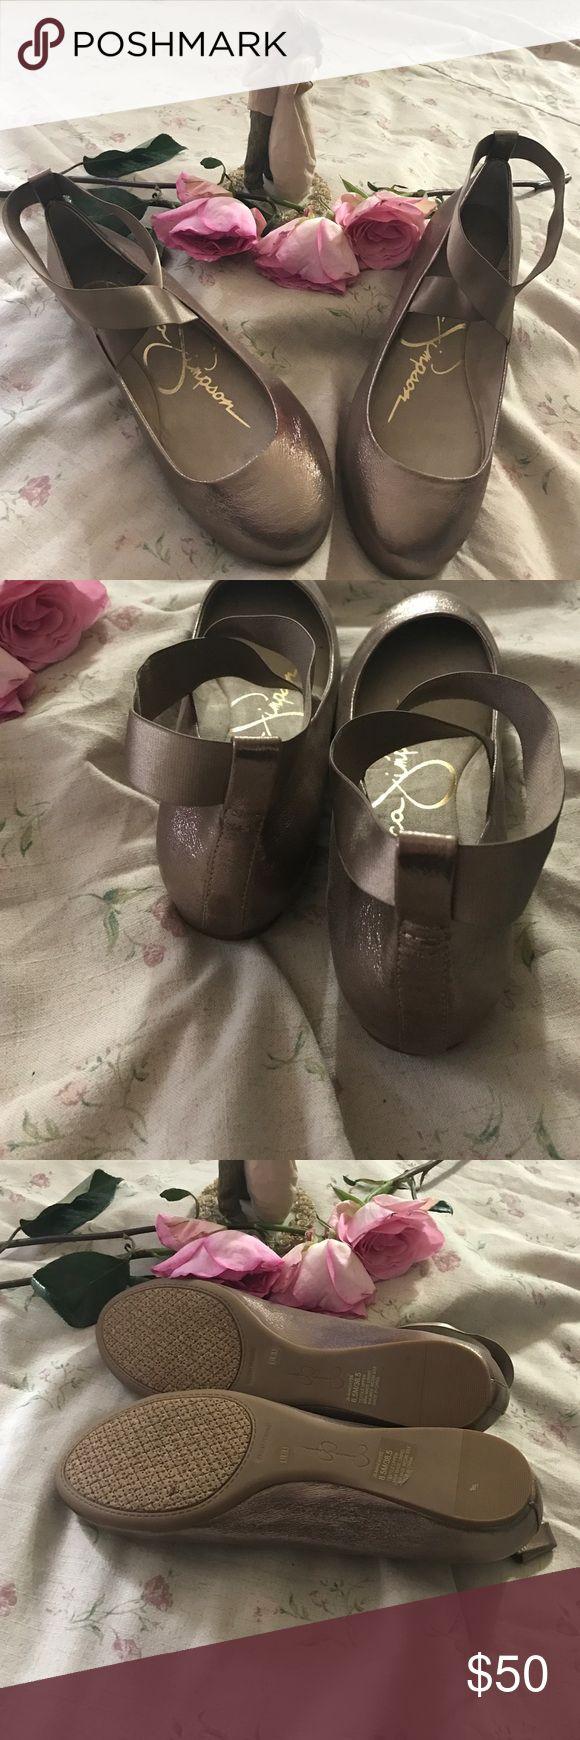 NEW Jessica Simpson Mandayss Ballet flats New. No box. Size 8.5. Color sandbar/gold Jessica Simpson Shoes Flats & Loafers